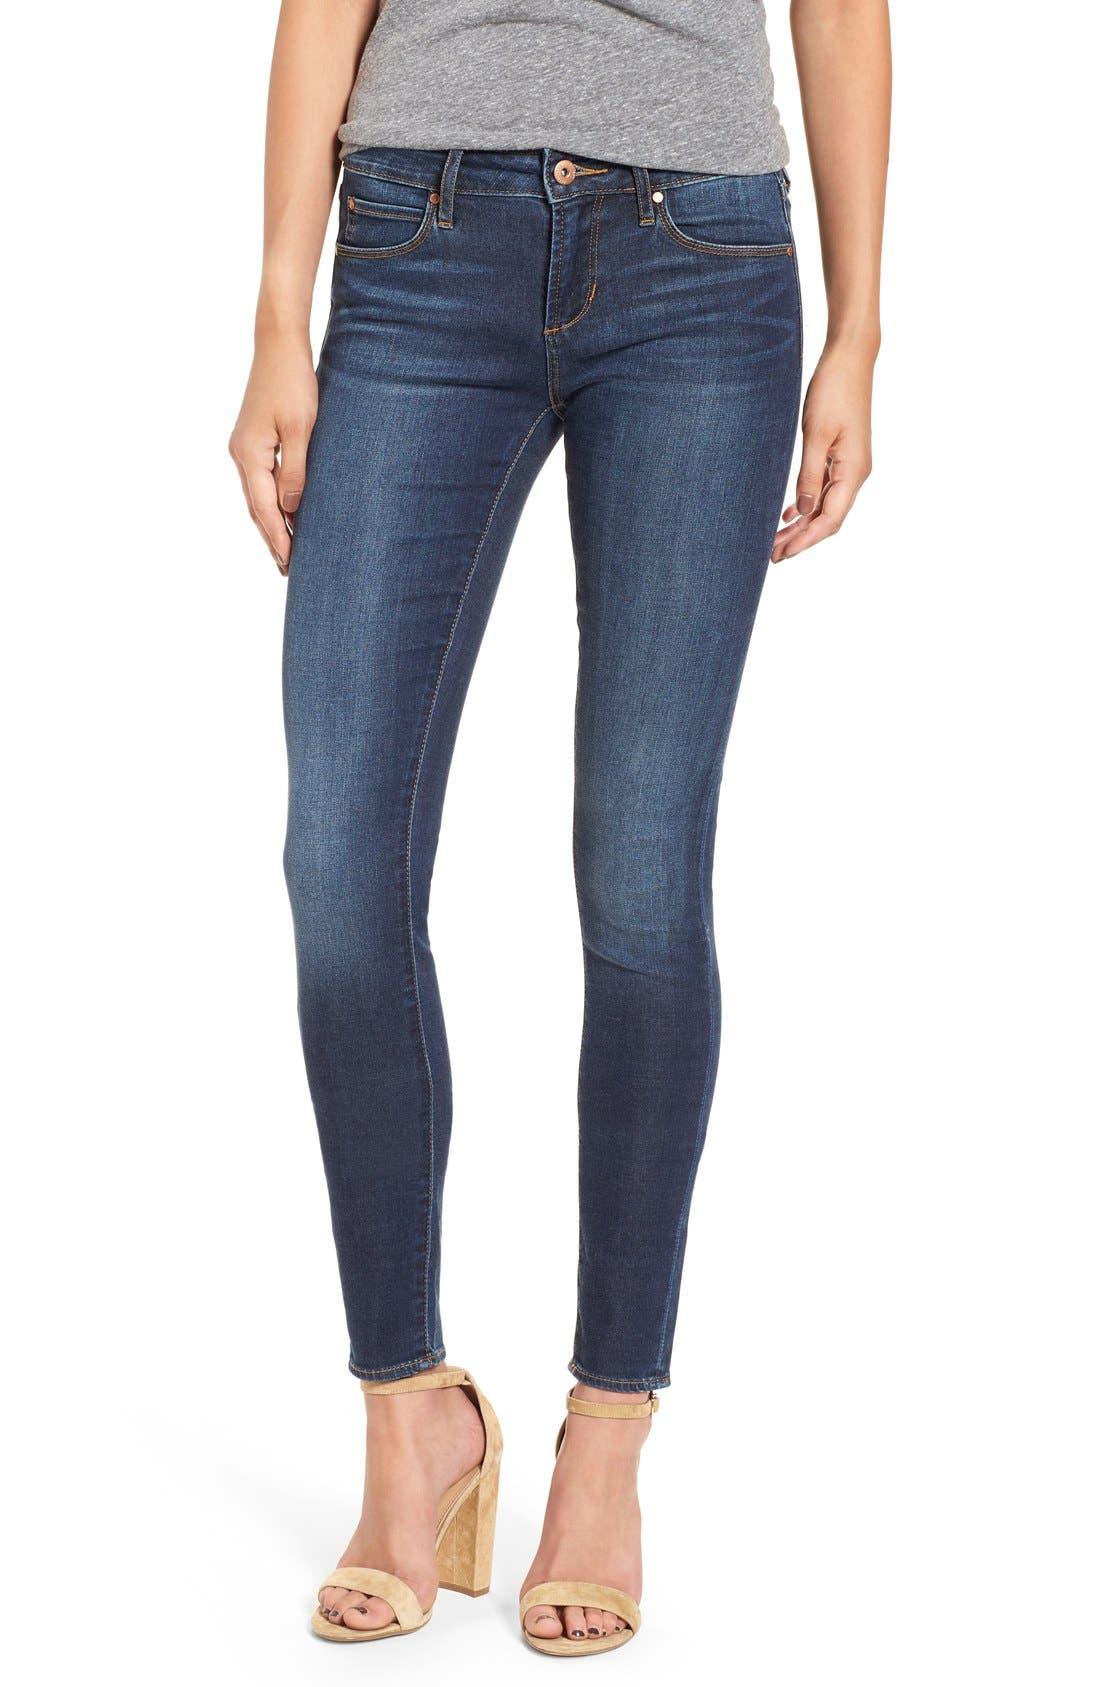 Alternate Image 1 Selected - Articles of Society 'Mya' Skinny Jeans (Glendale)